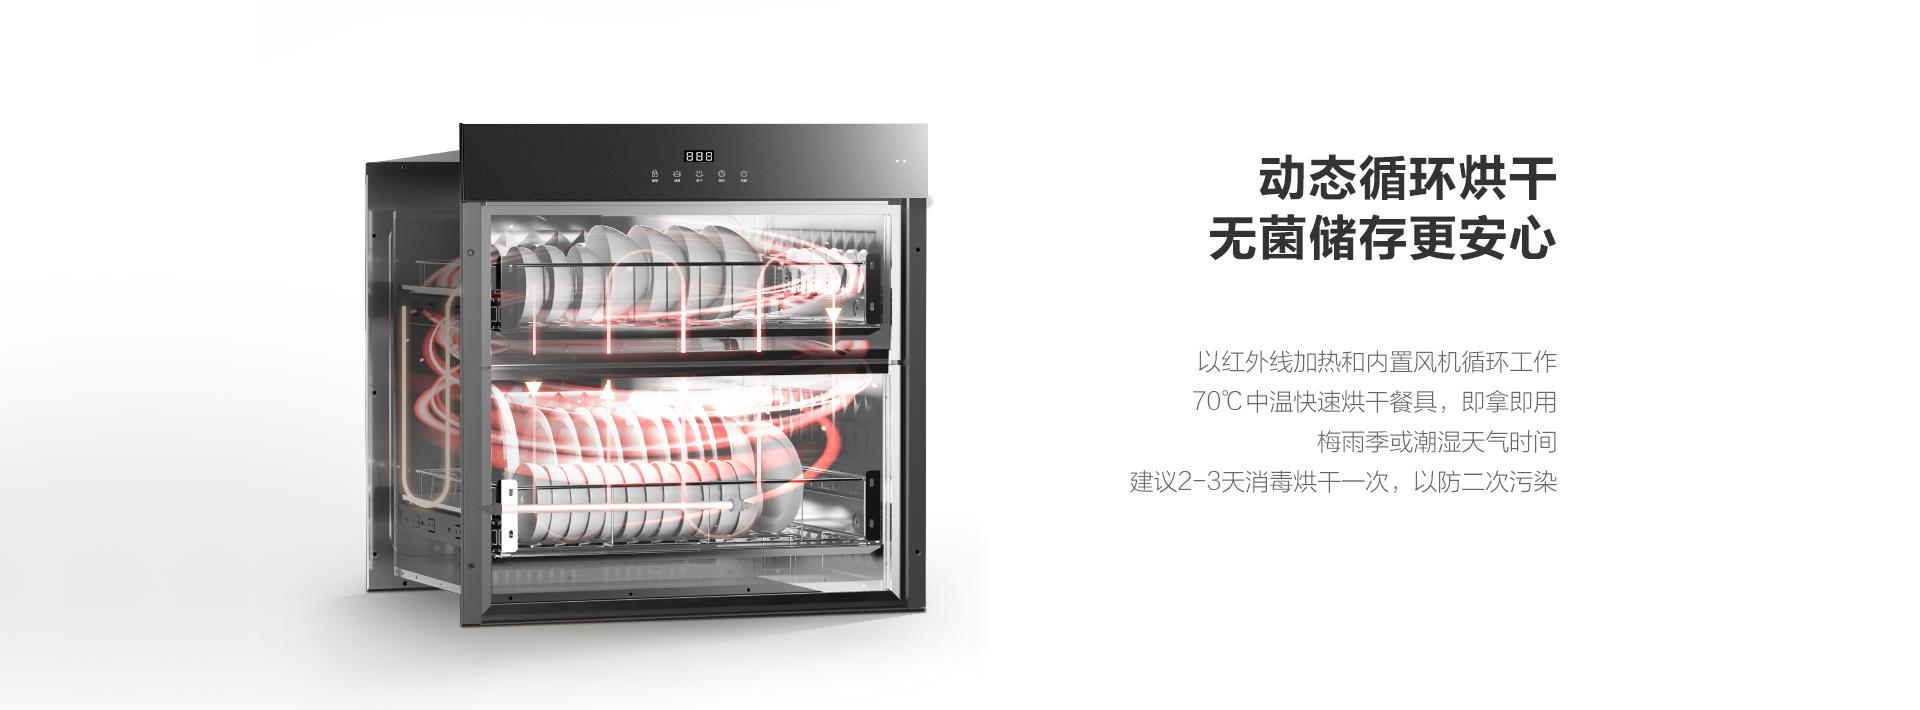 XB819消毒柜官网上新-201116_03.png